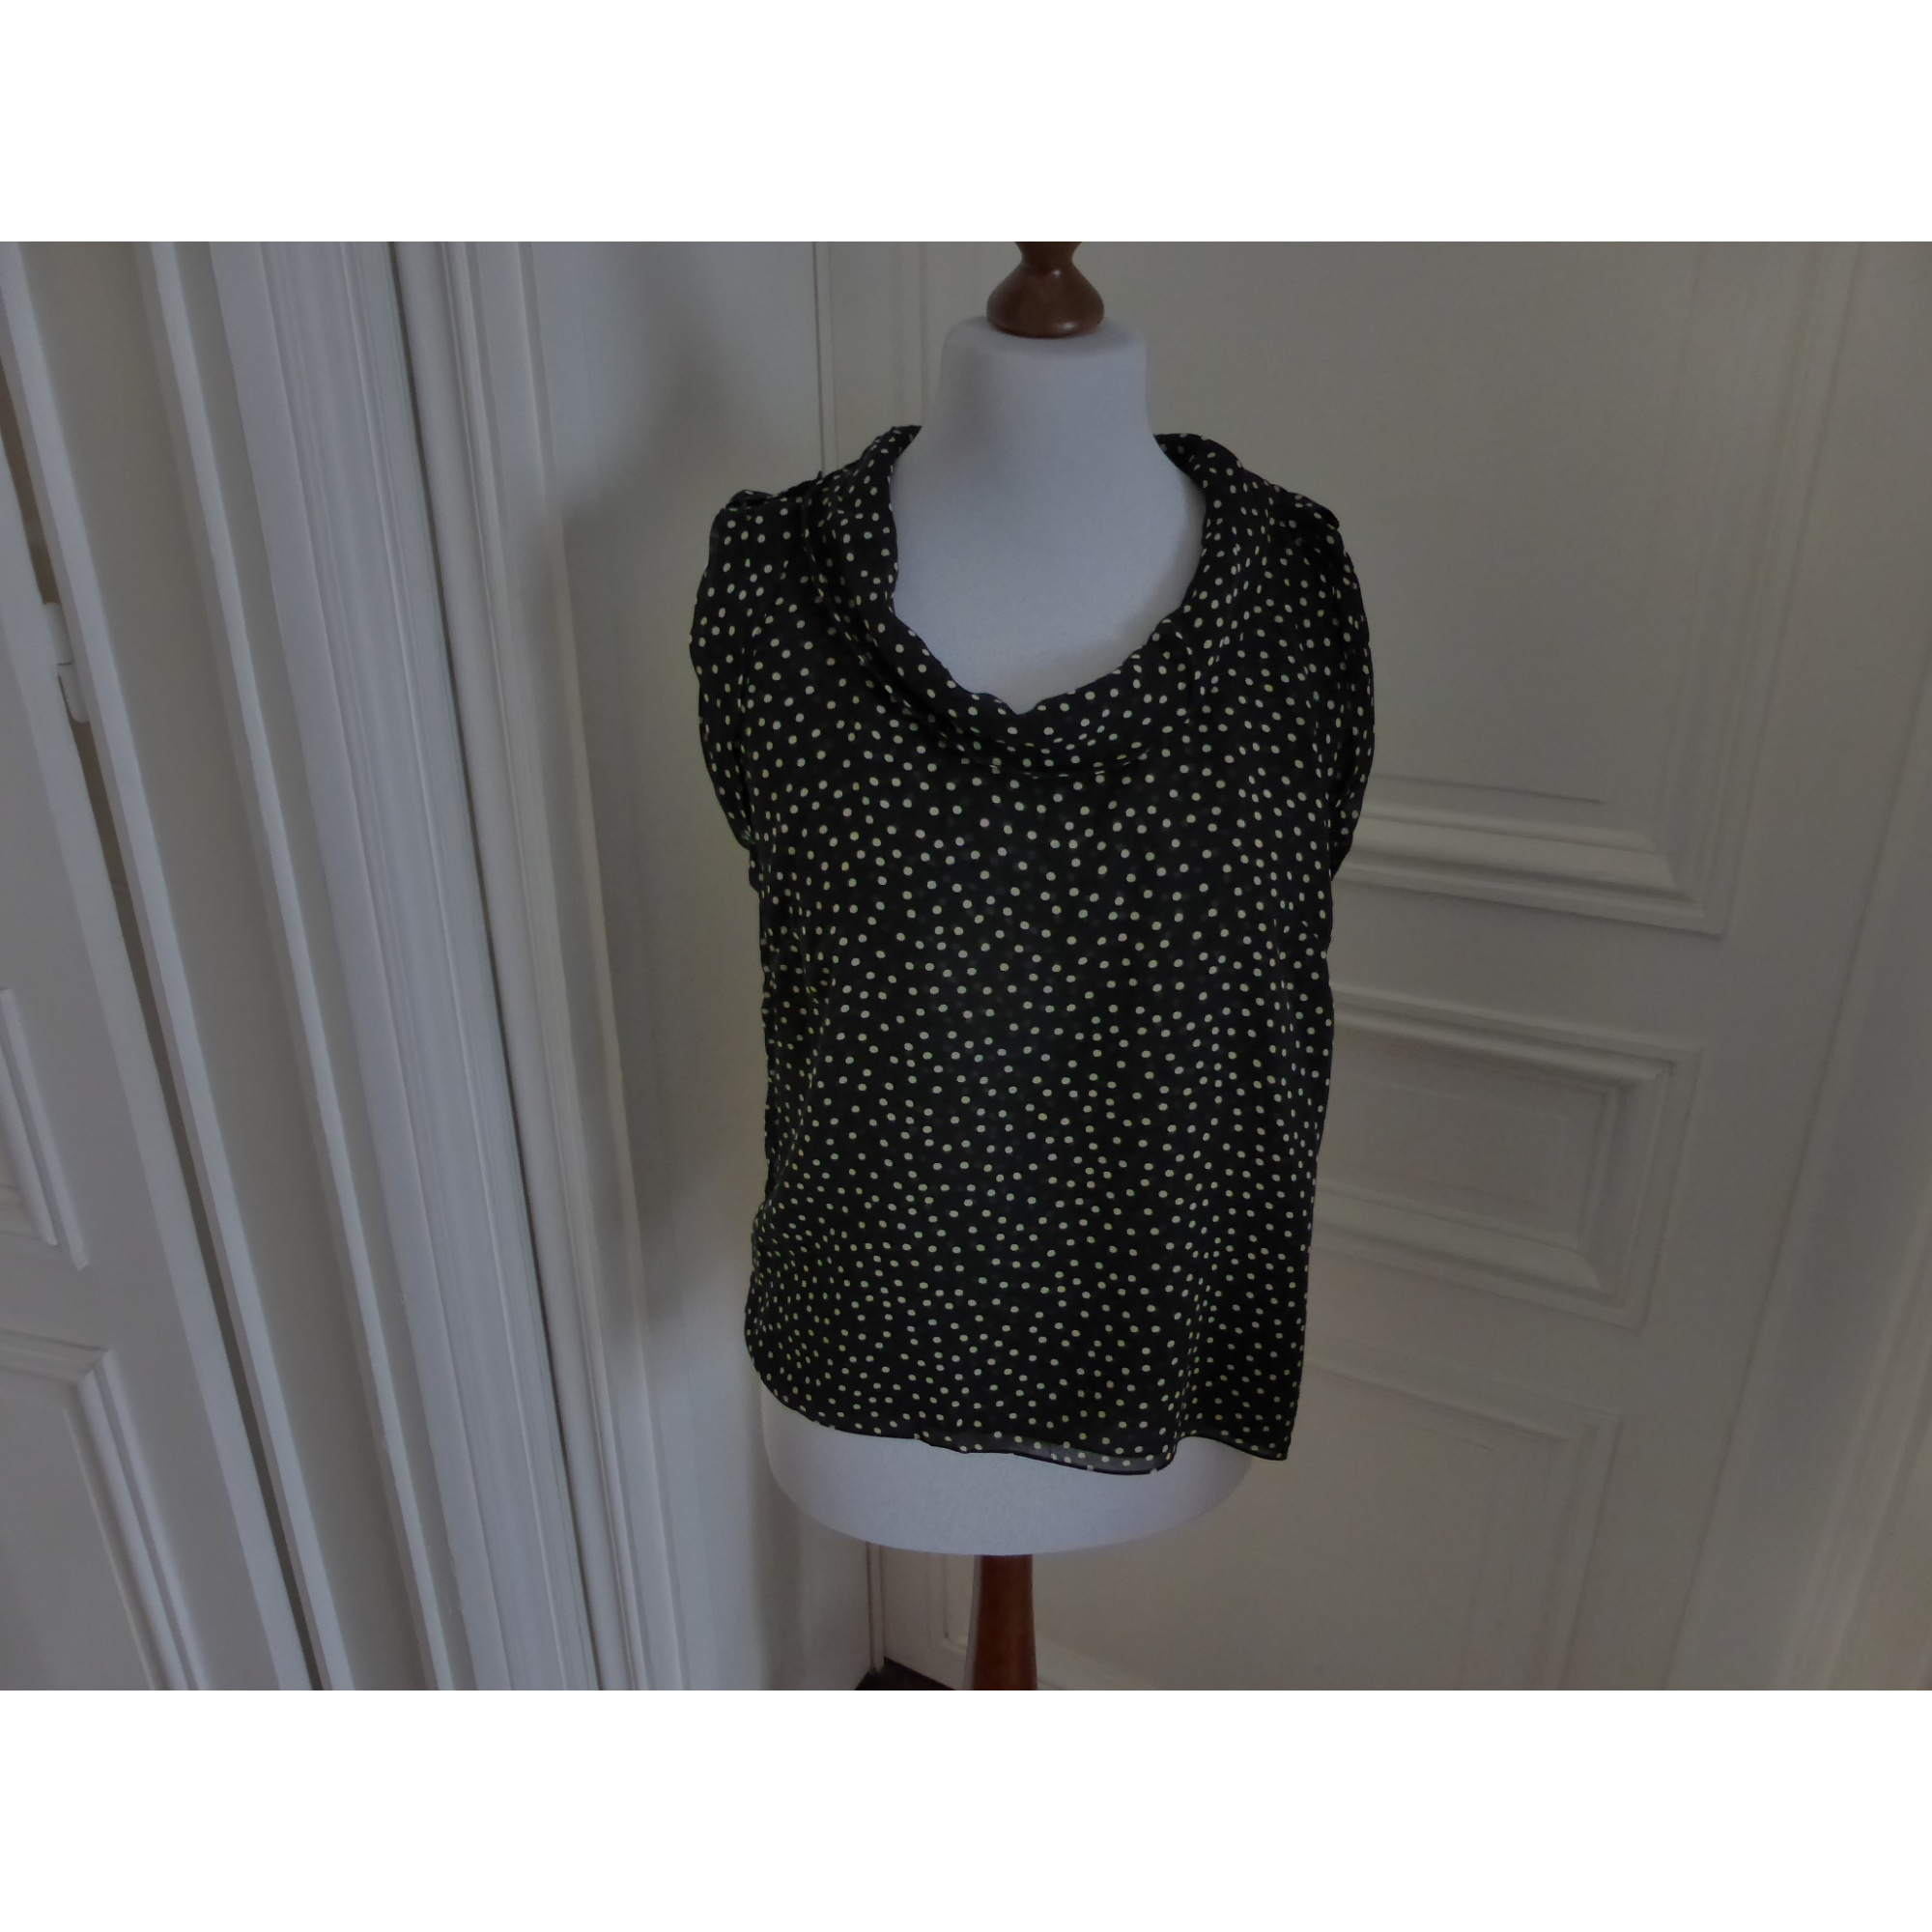 Minimaliste Synonyme top, tee-shirt synonyme de george rech 44 (xl/xxl, t5) noir et pois